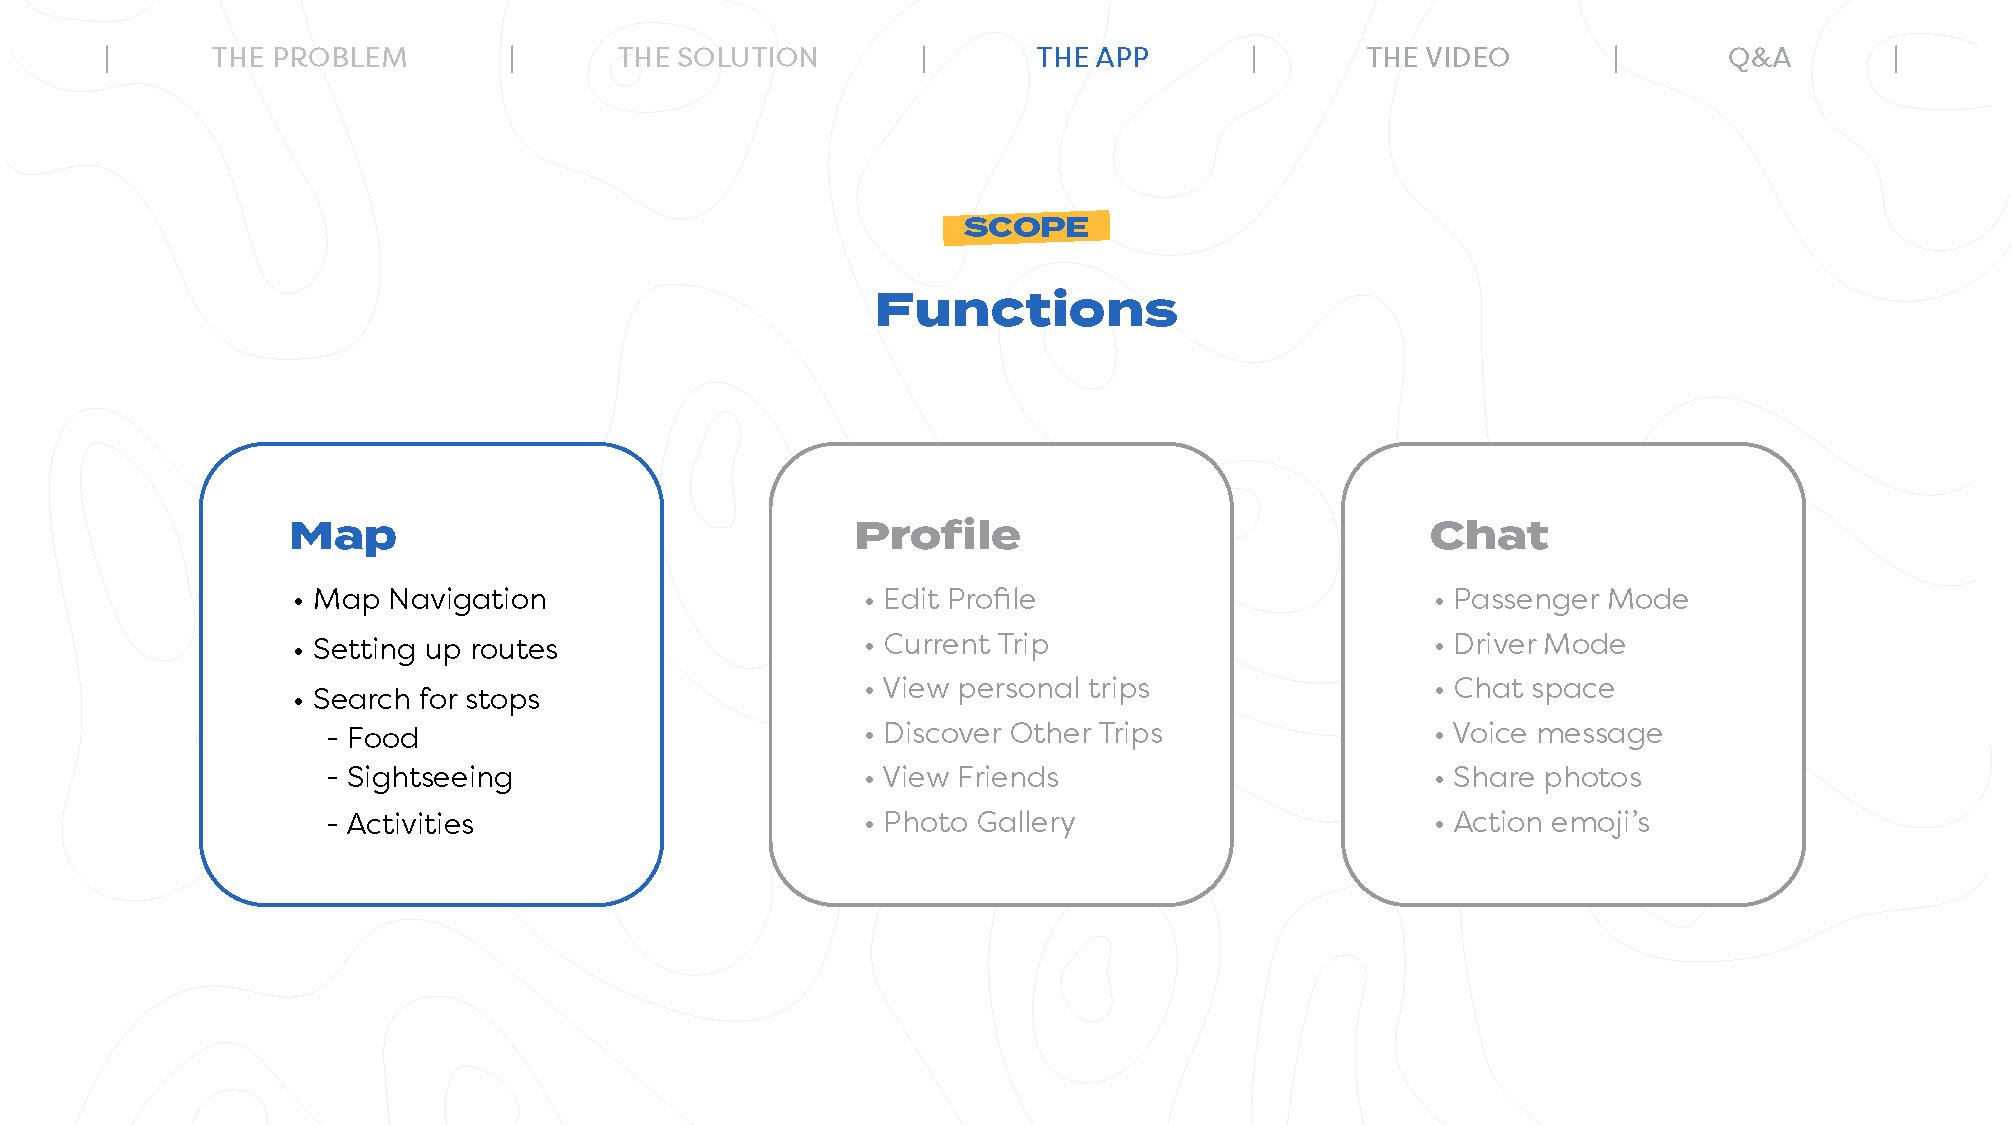 EXC3_Trippin_Presentation_FINAL_Page_19.jpg